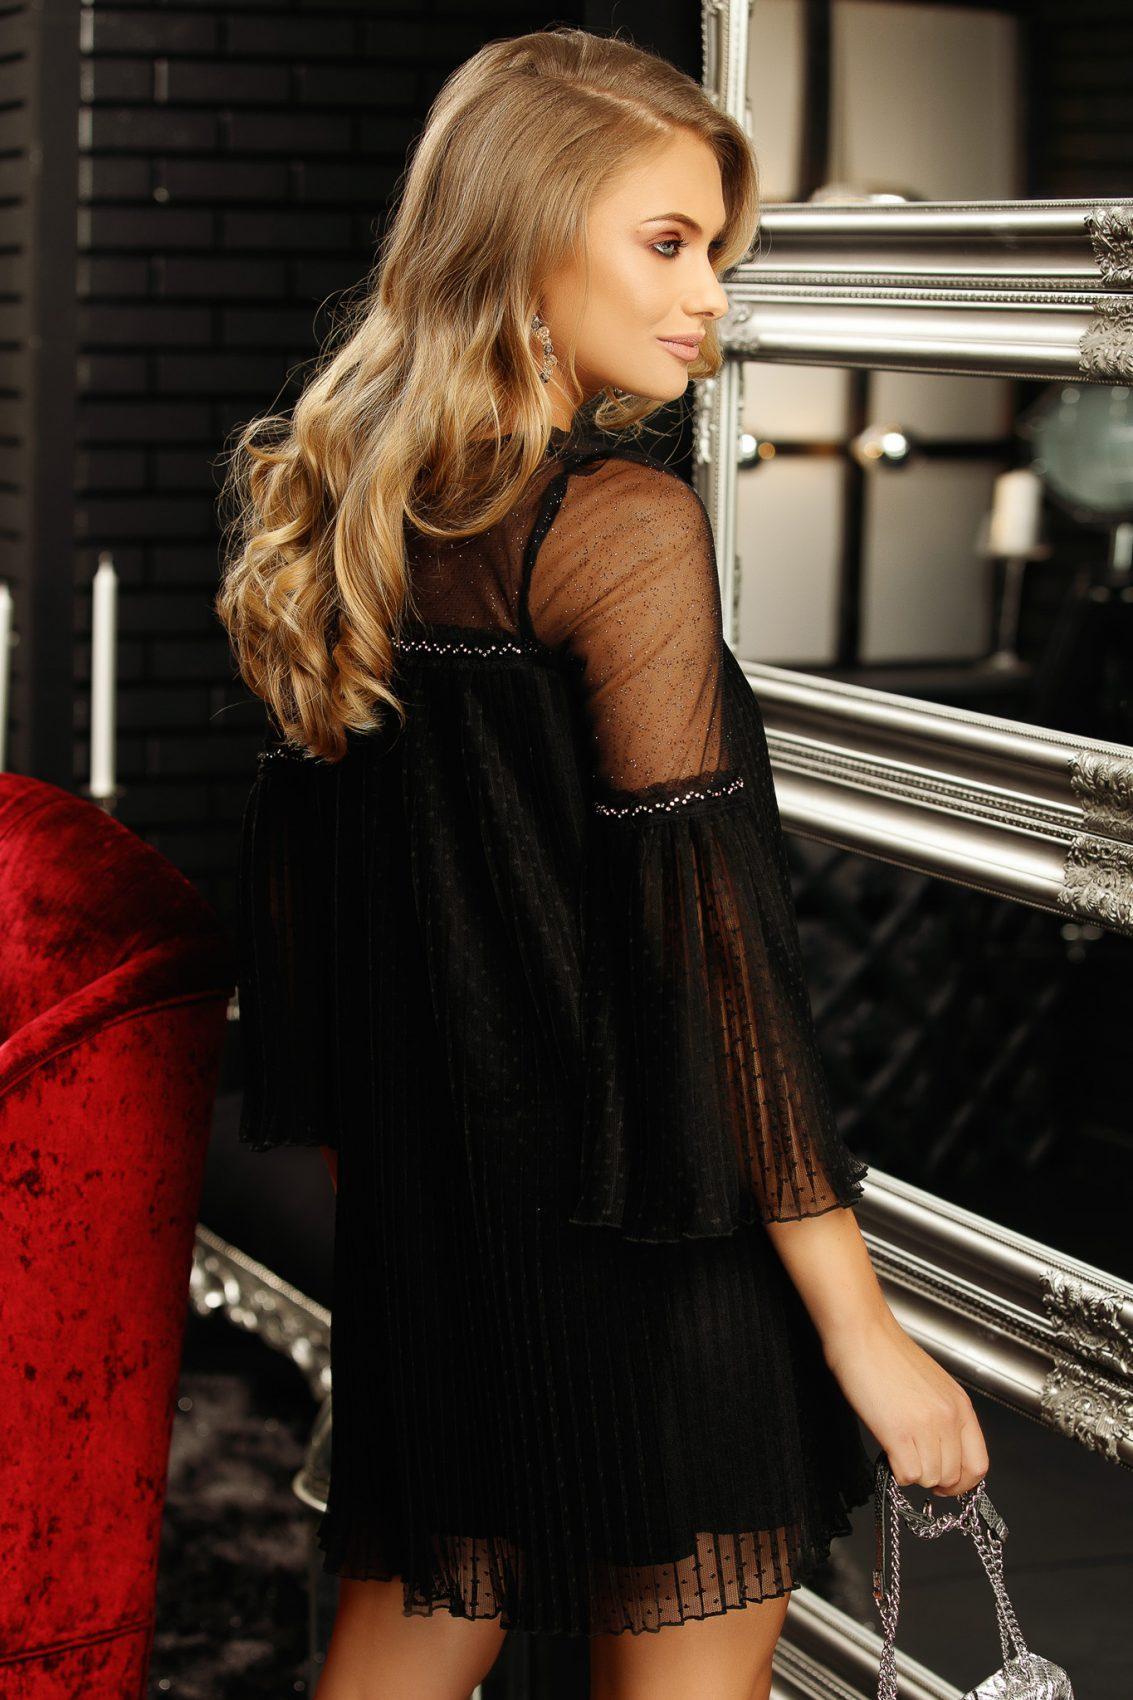 Lorelai Mini Μαύρο Φόρεμα 5322